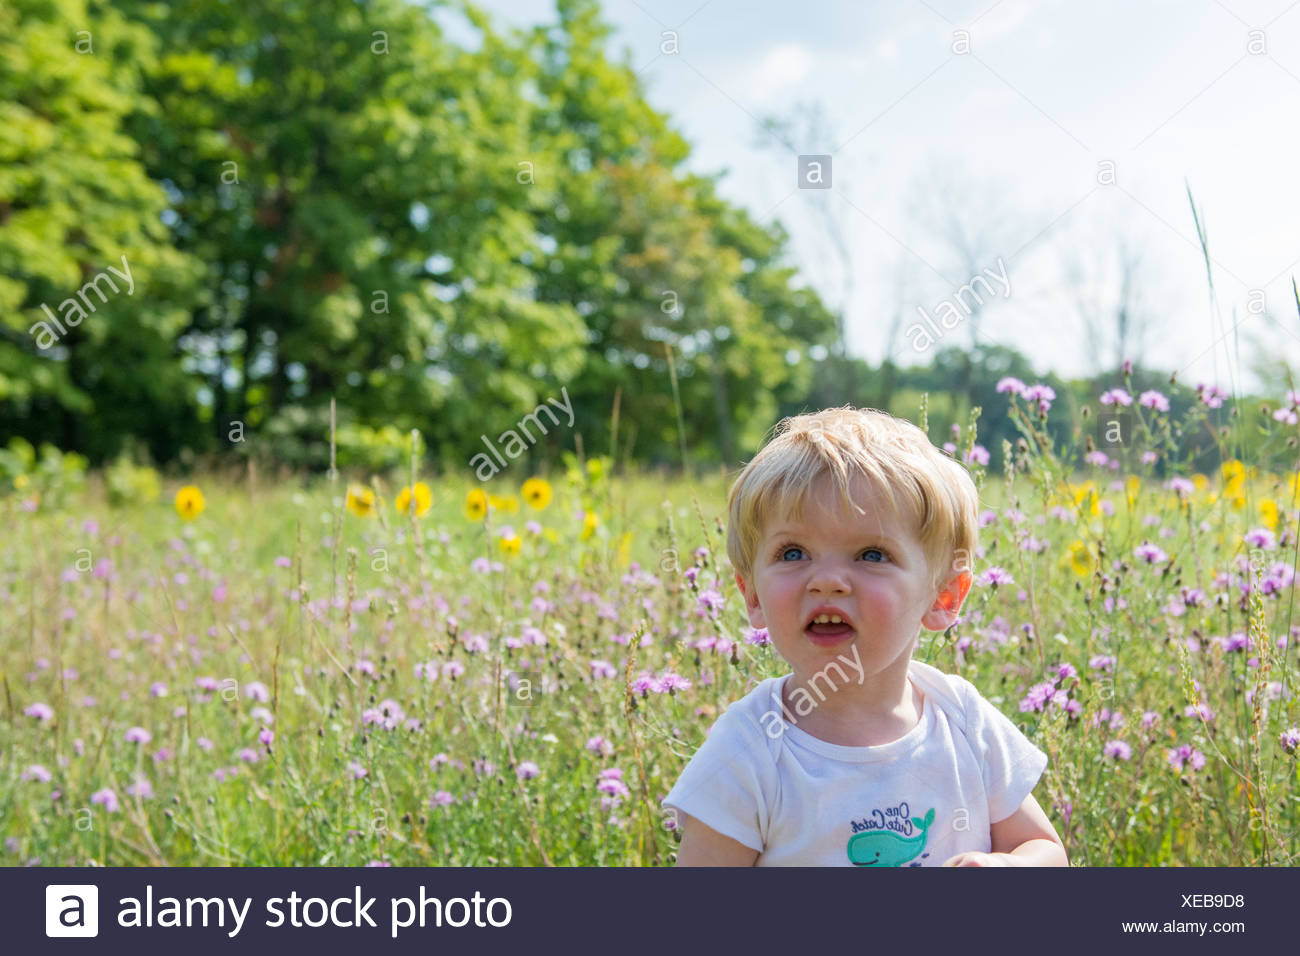 Boy sitting in a meadow, Michigan, America, USA - Stock Image